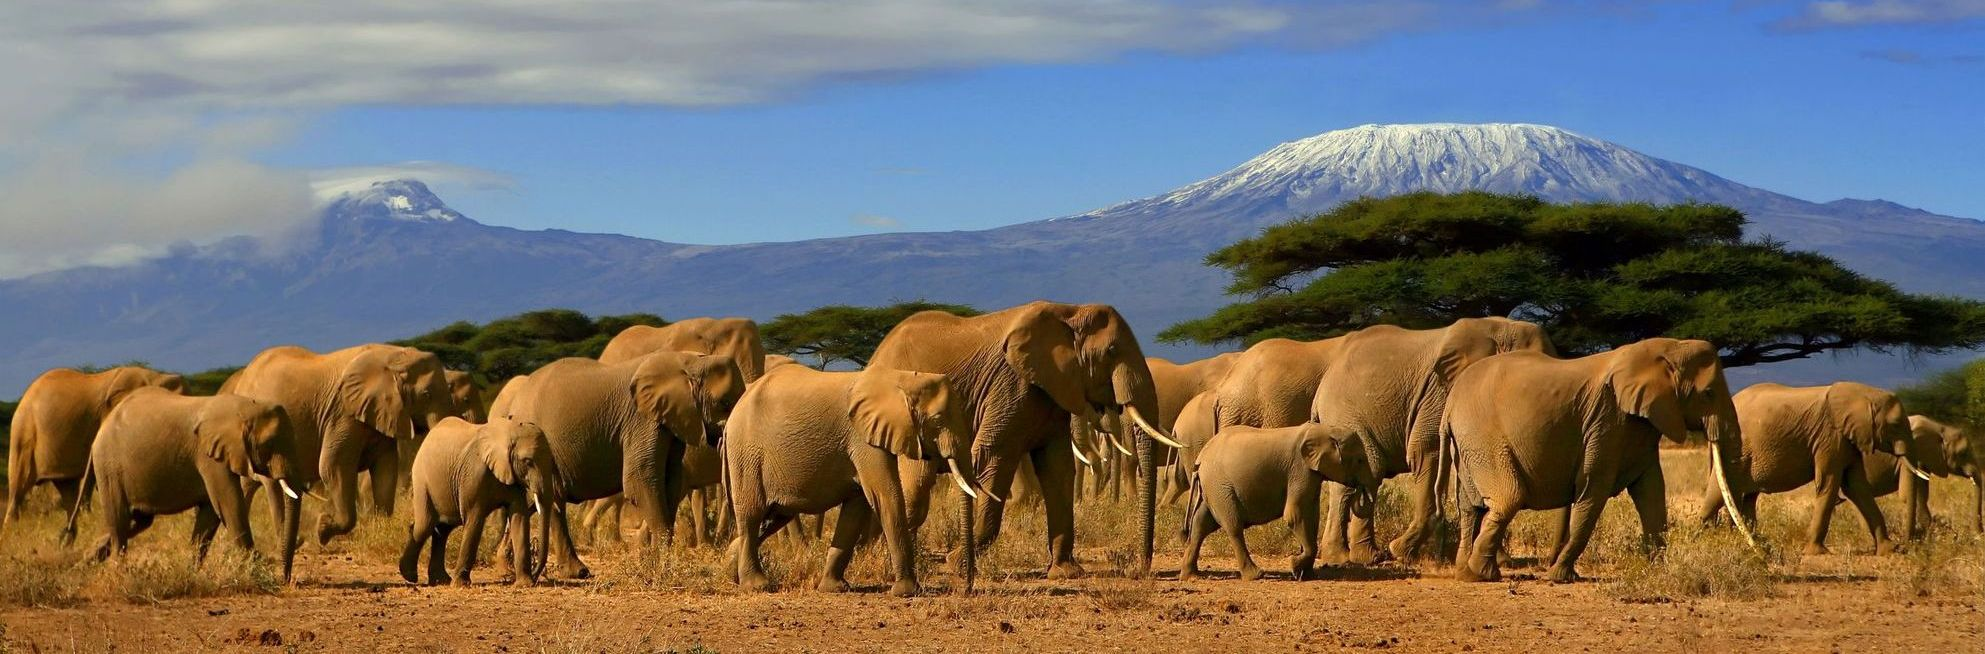 Kenya Safari Africa Zanzibar